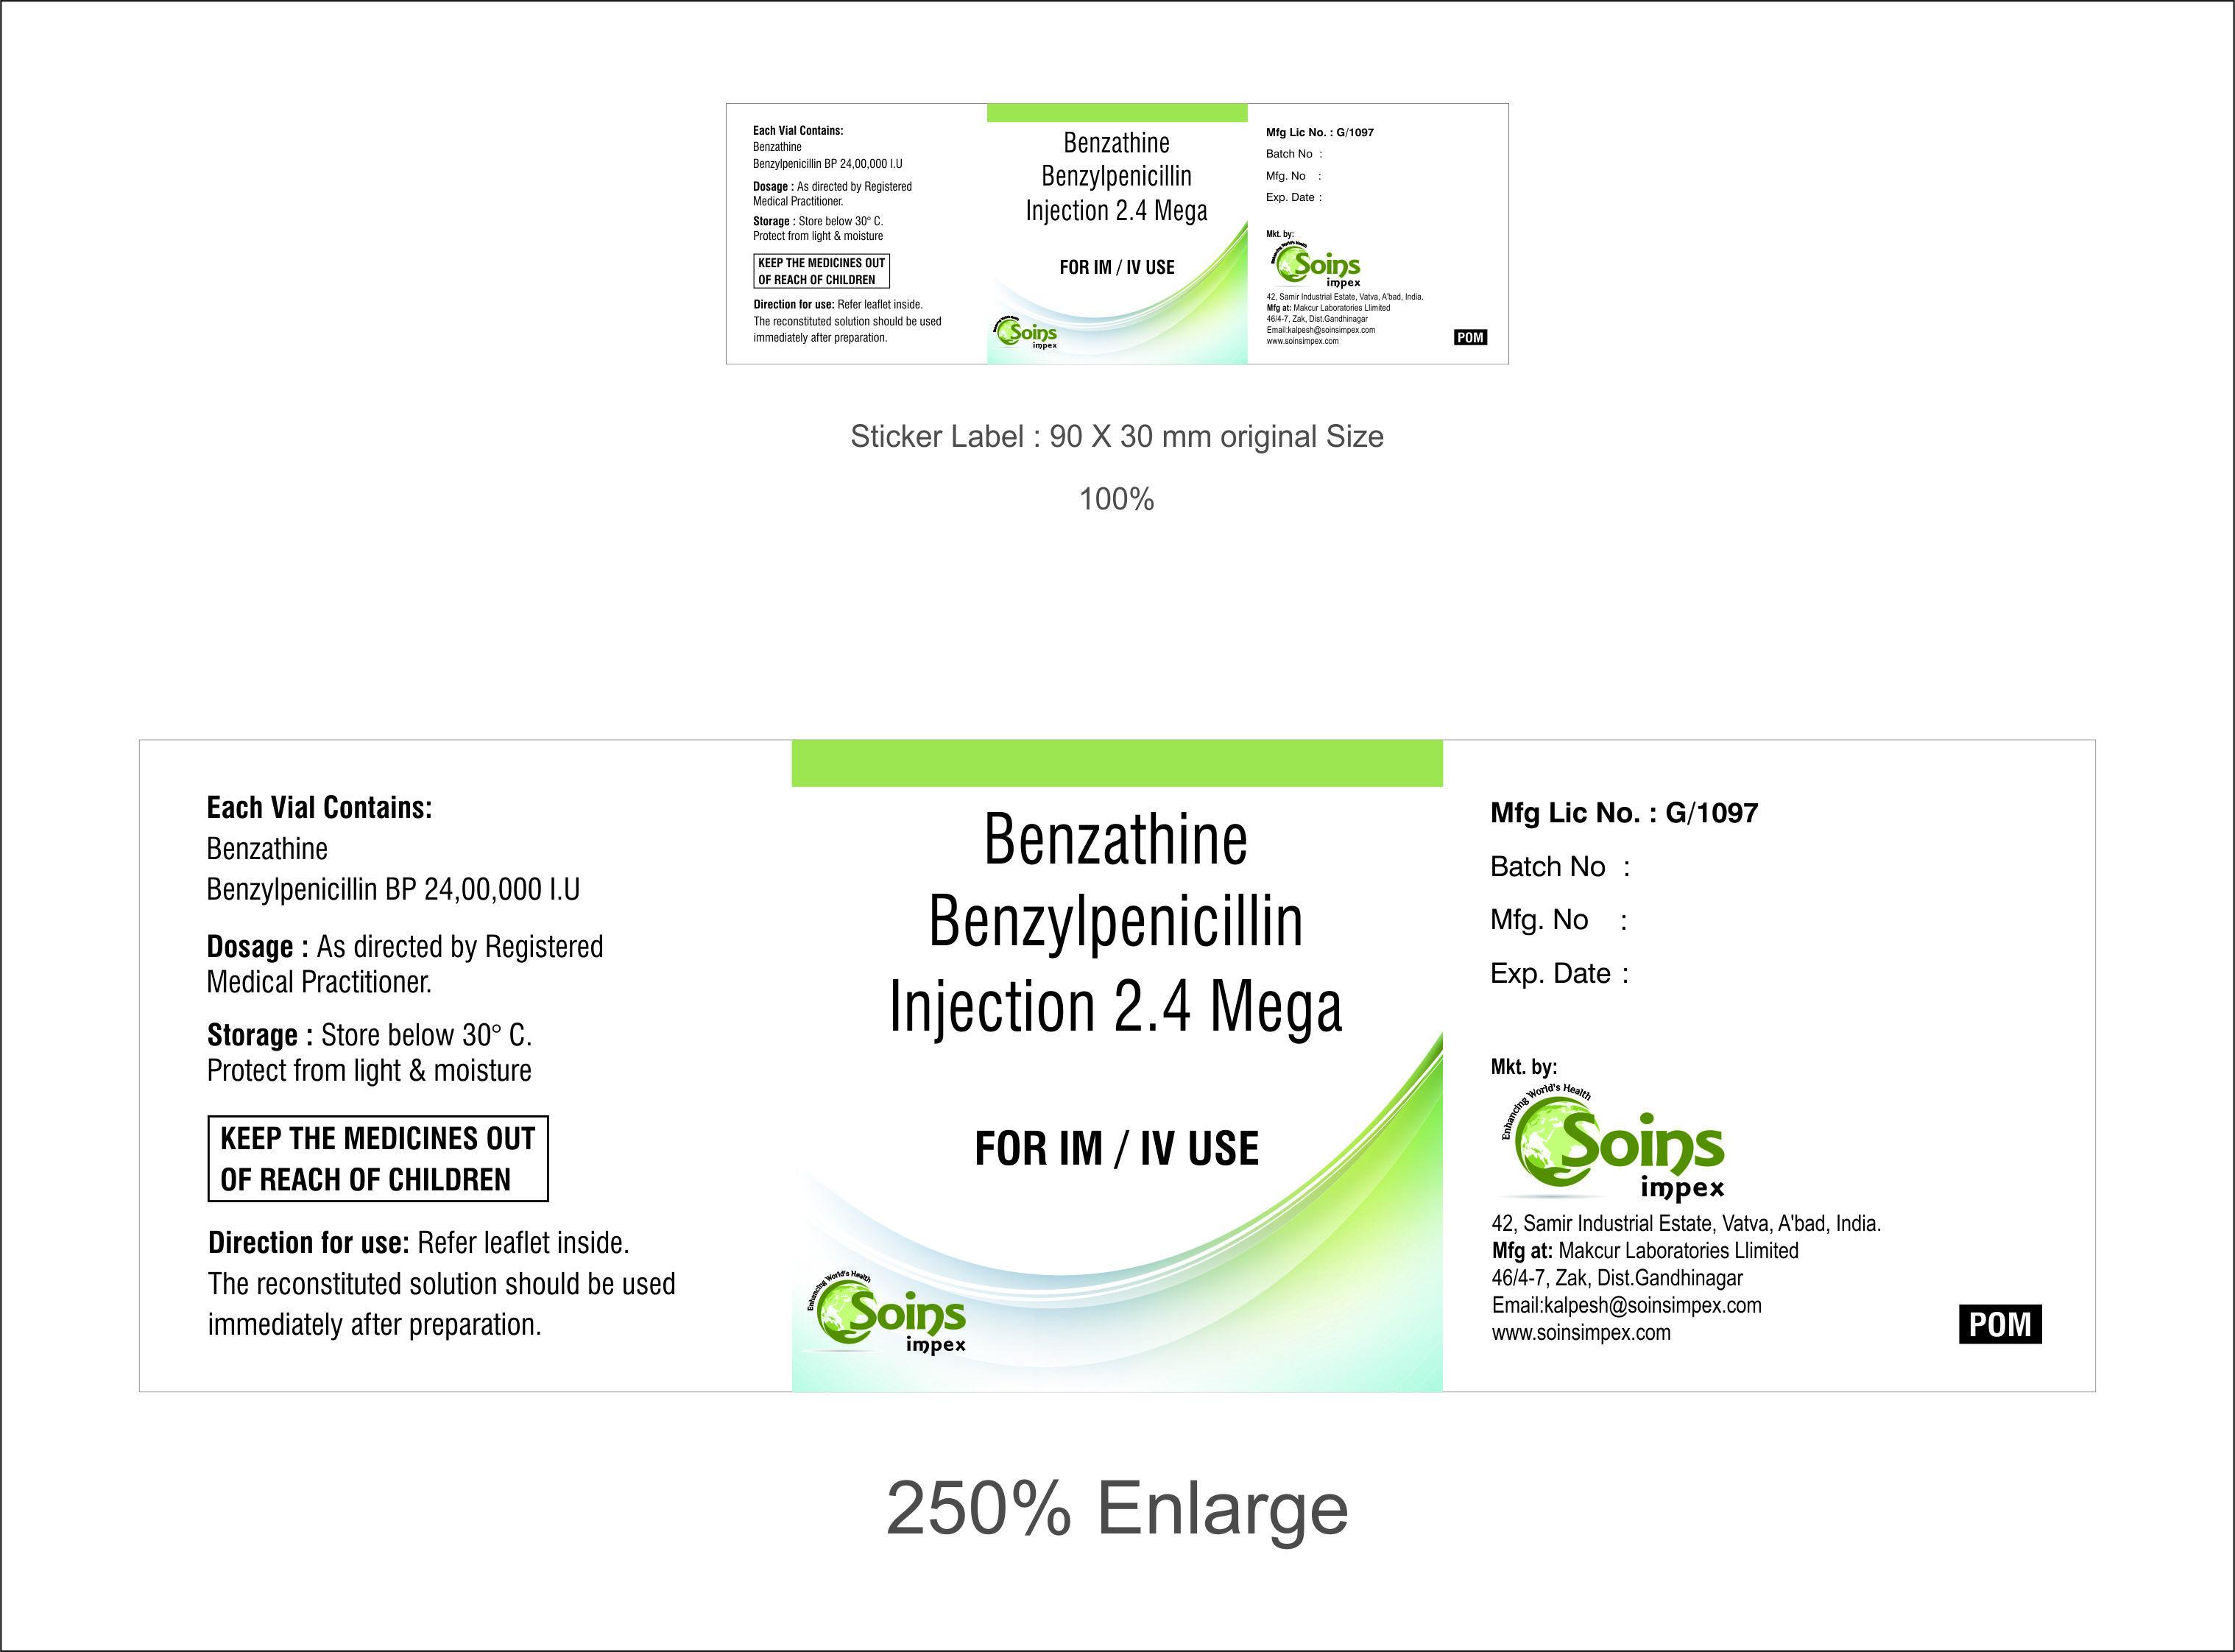 Benzathine Benzylpenicillin 2.4 Mega